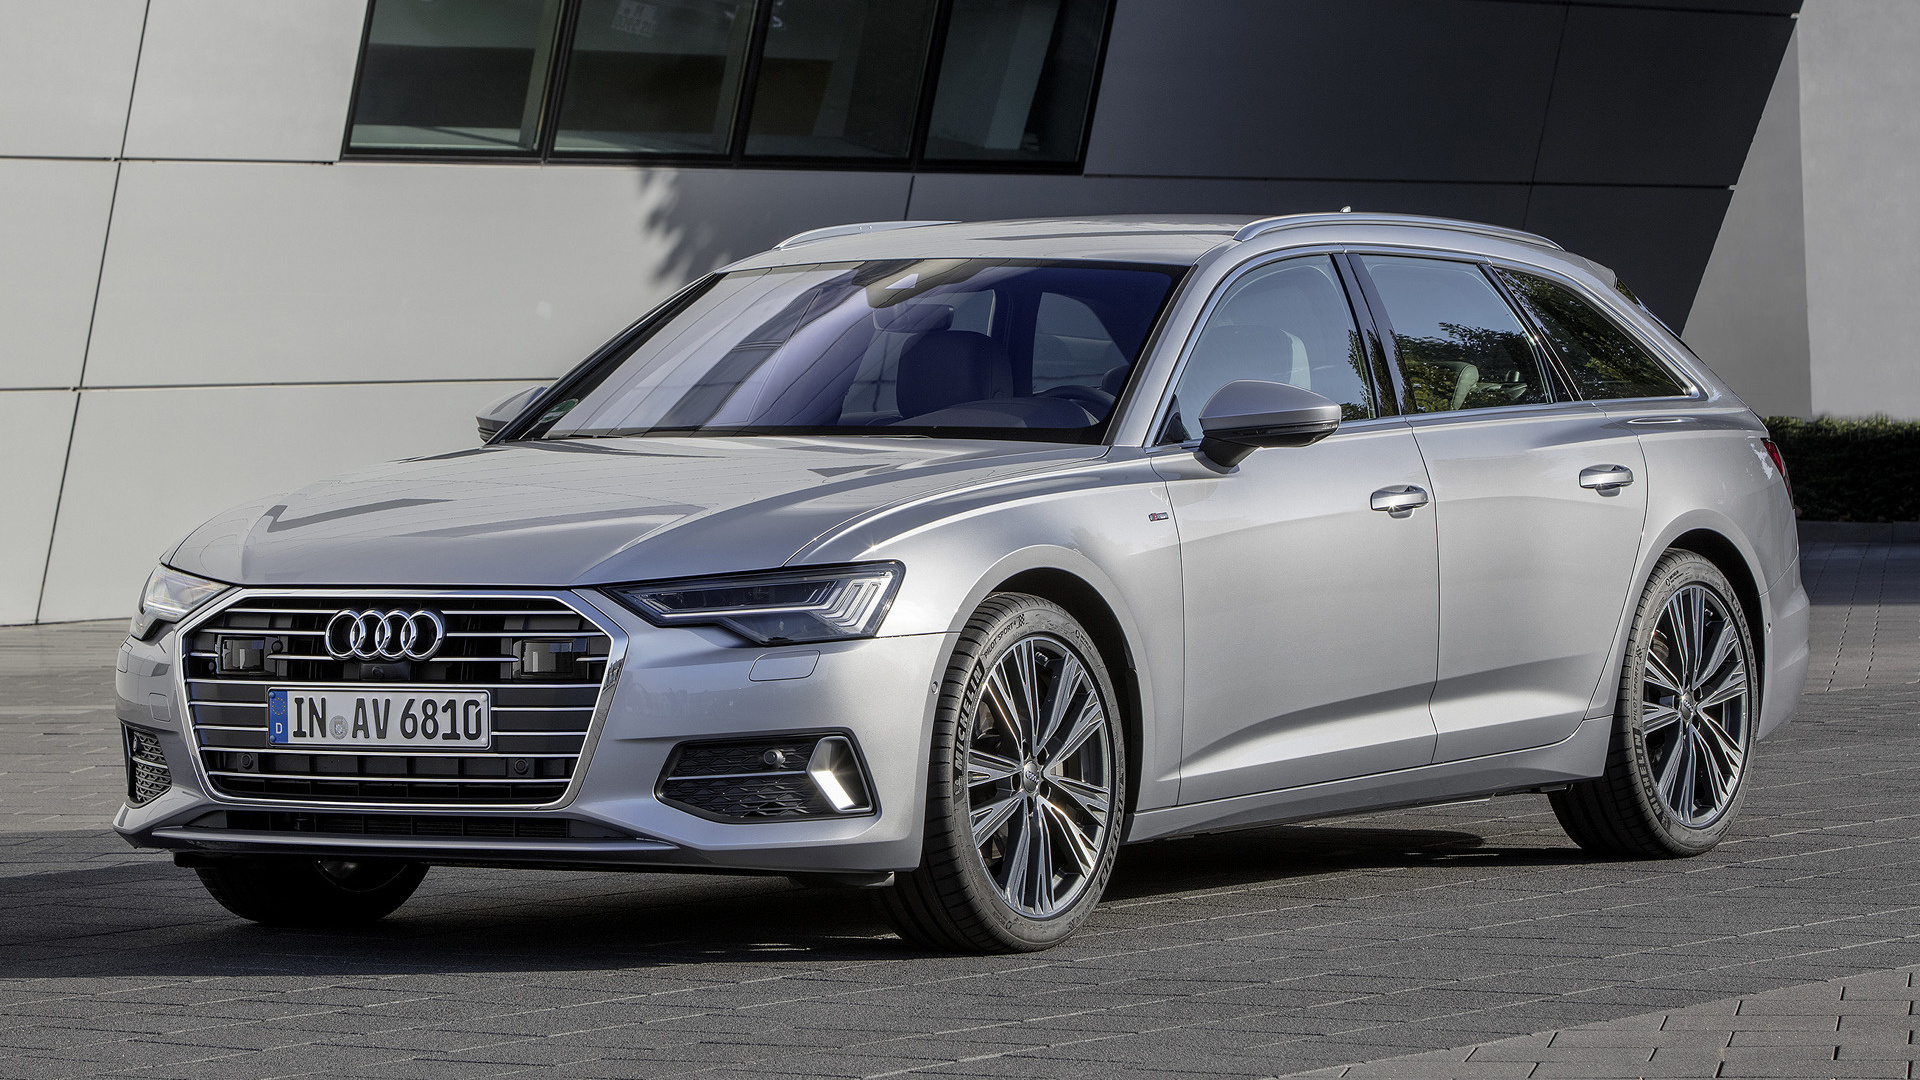 2018 Audi A6 Avant - Wallpapers and HD Images | Car Pixel